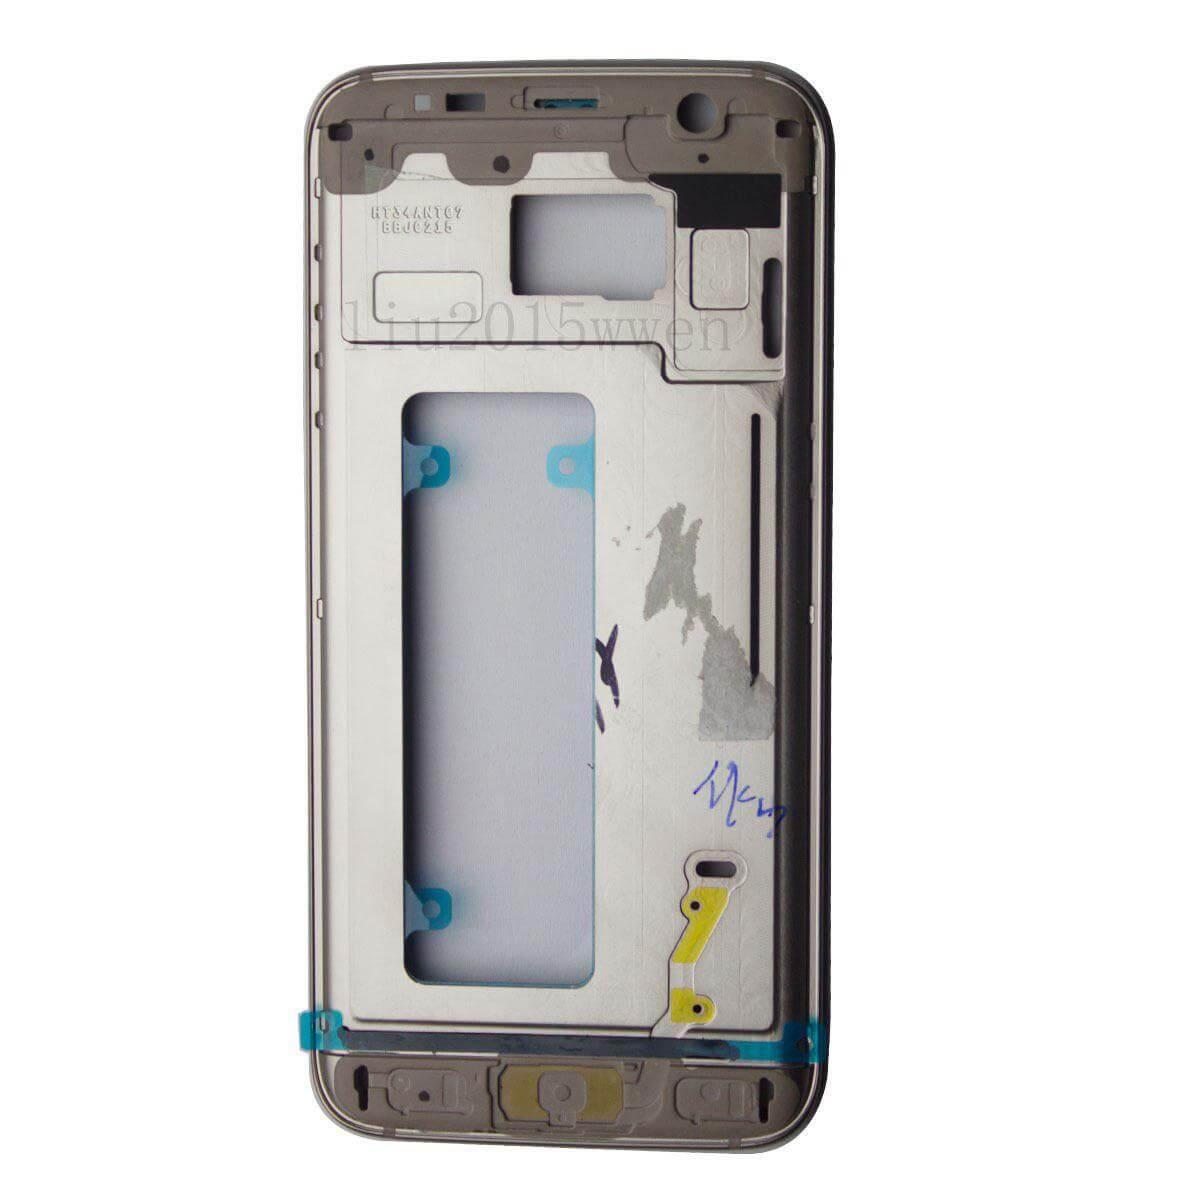 فلت-پاور-ولوم-گوشی-موبایل-گالکسی-اس-7-front-housing-lcd-frame-middle-421.jpg